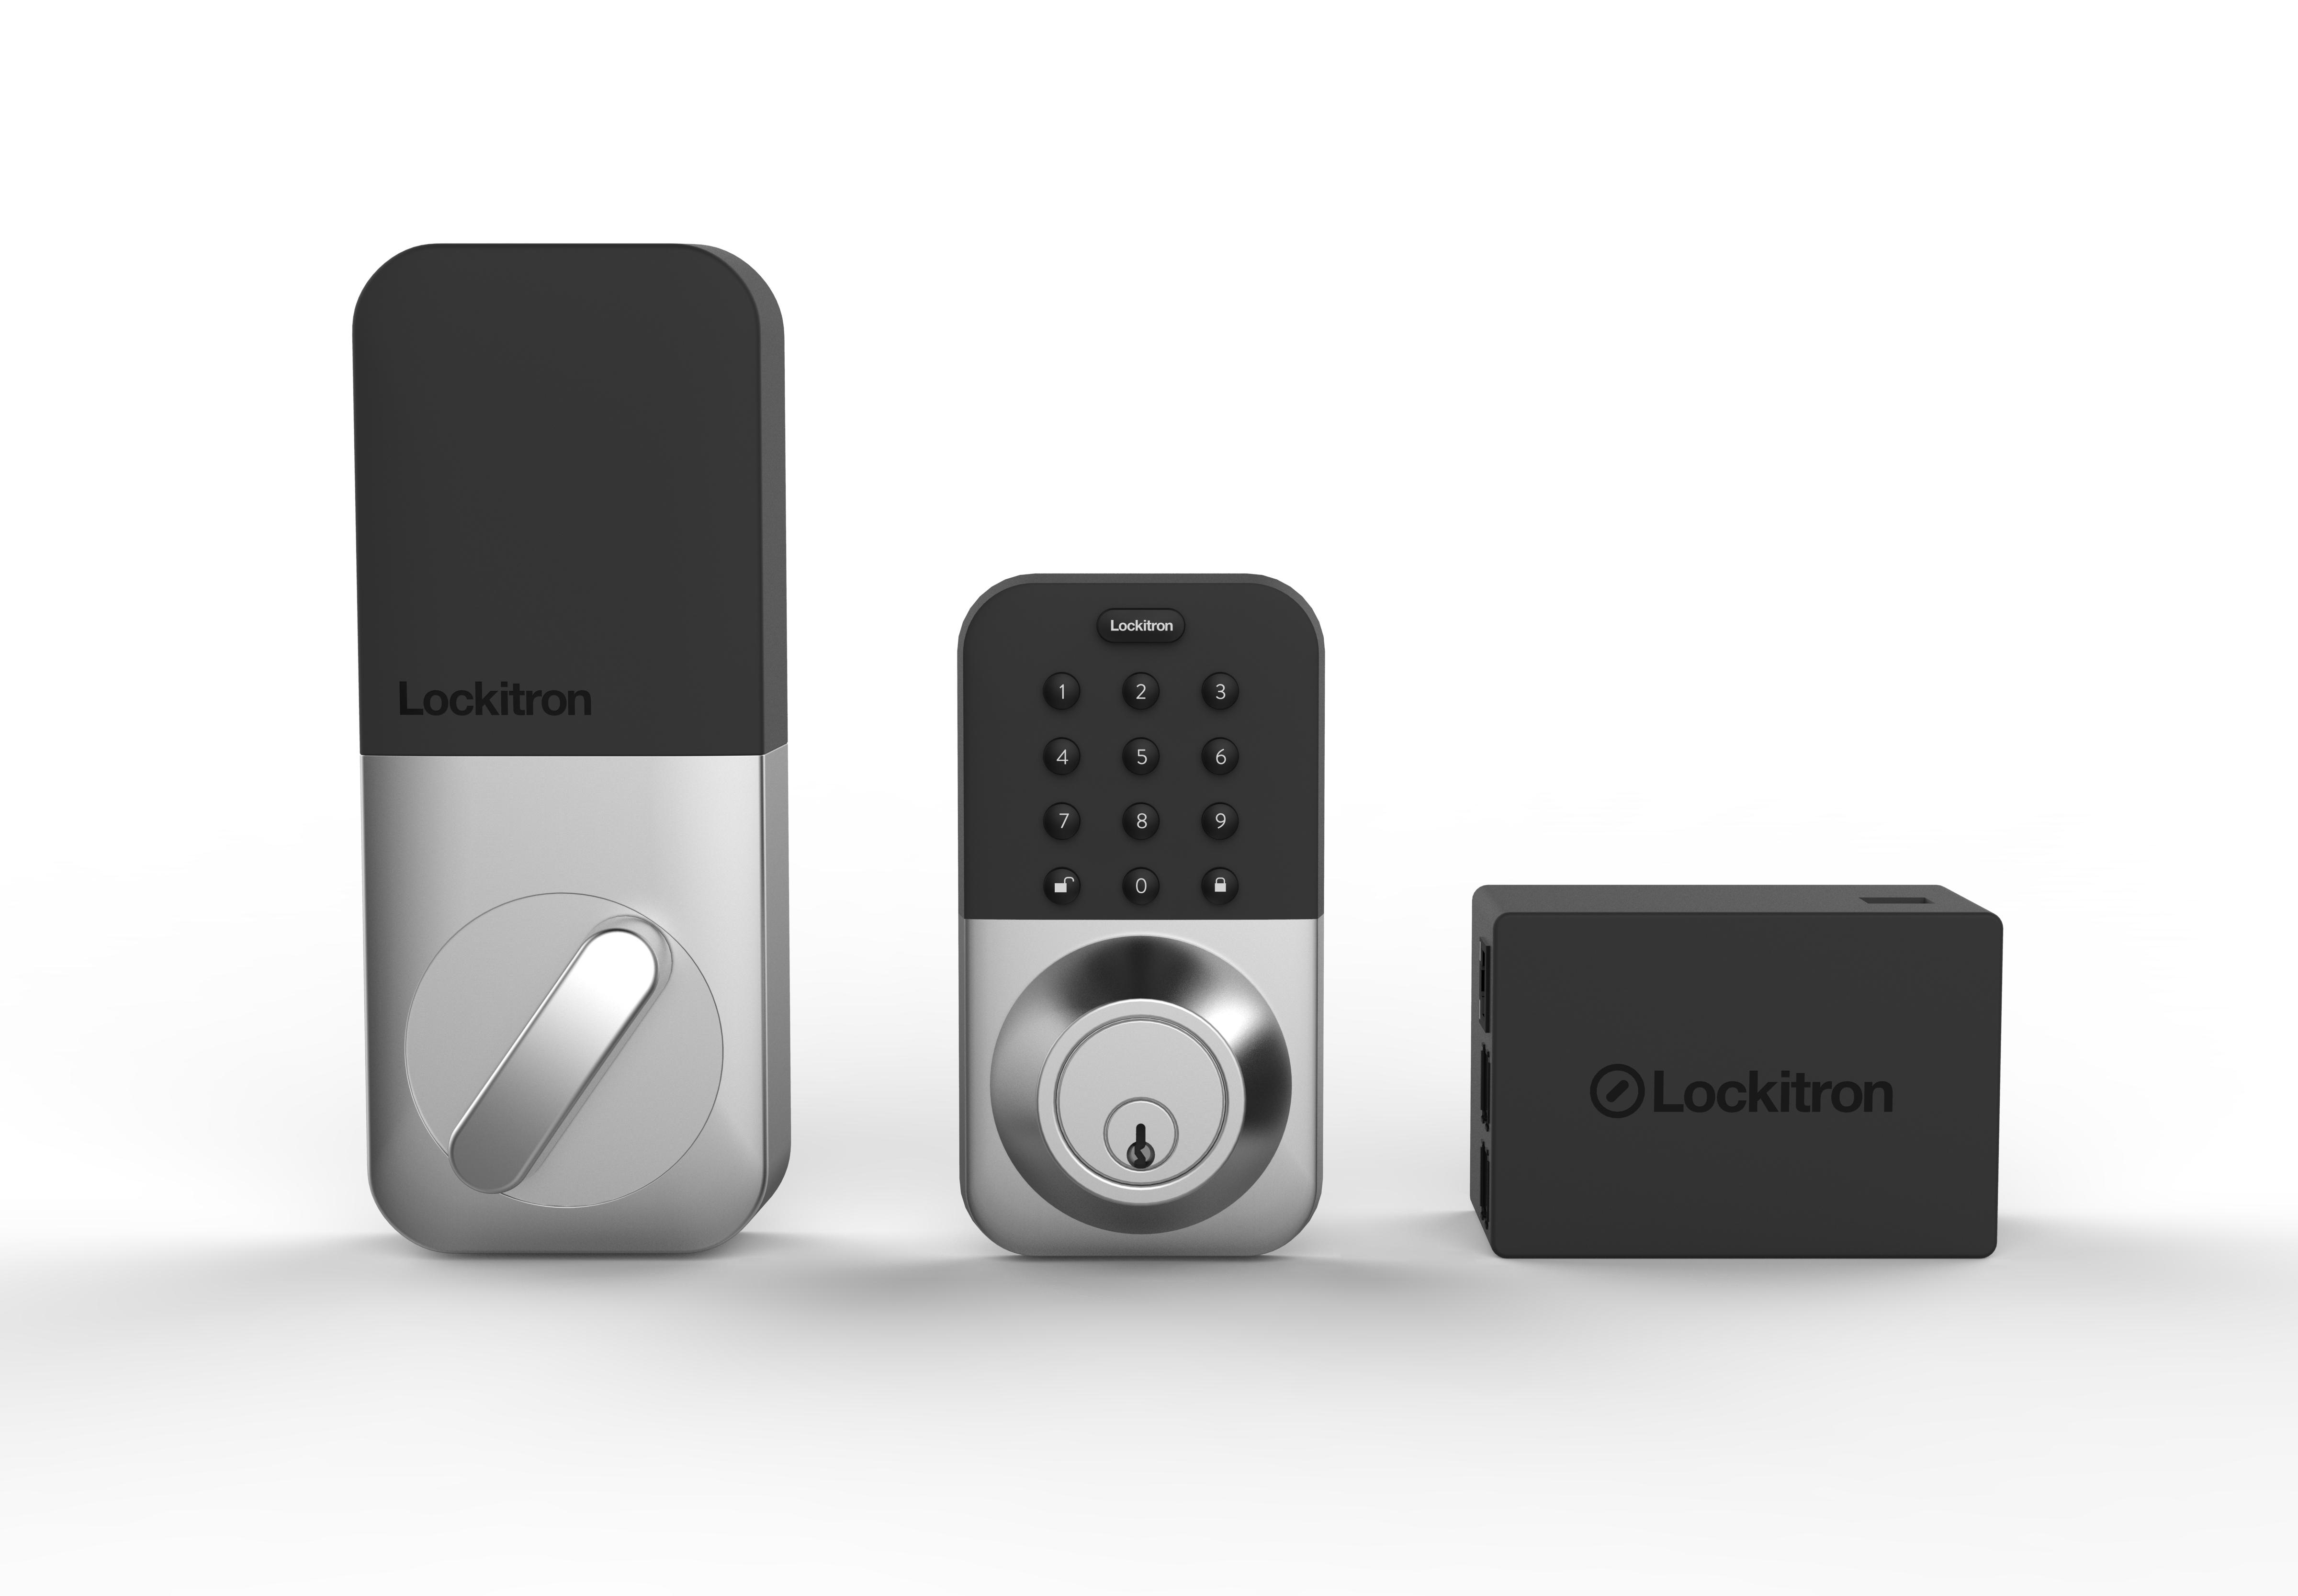 File:Lockitron smart lock keypad bridge.jpg - Wikimedia Commons